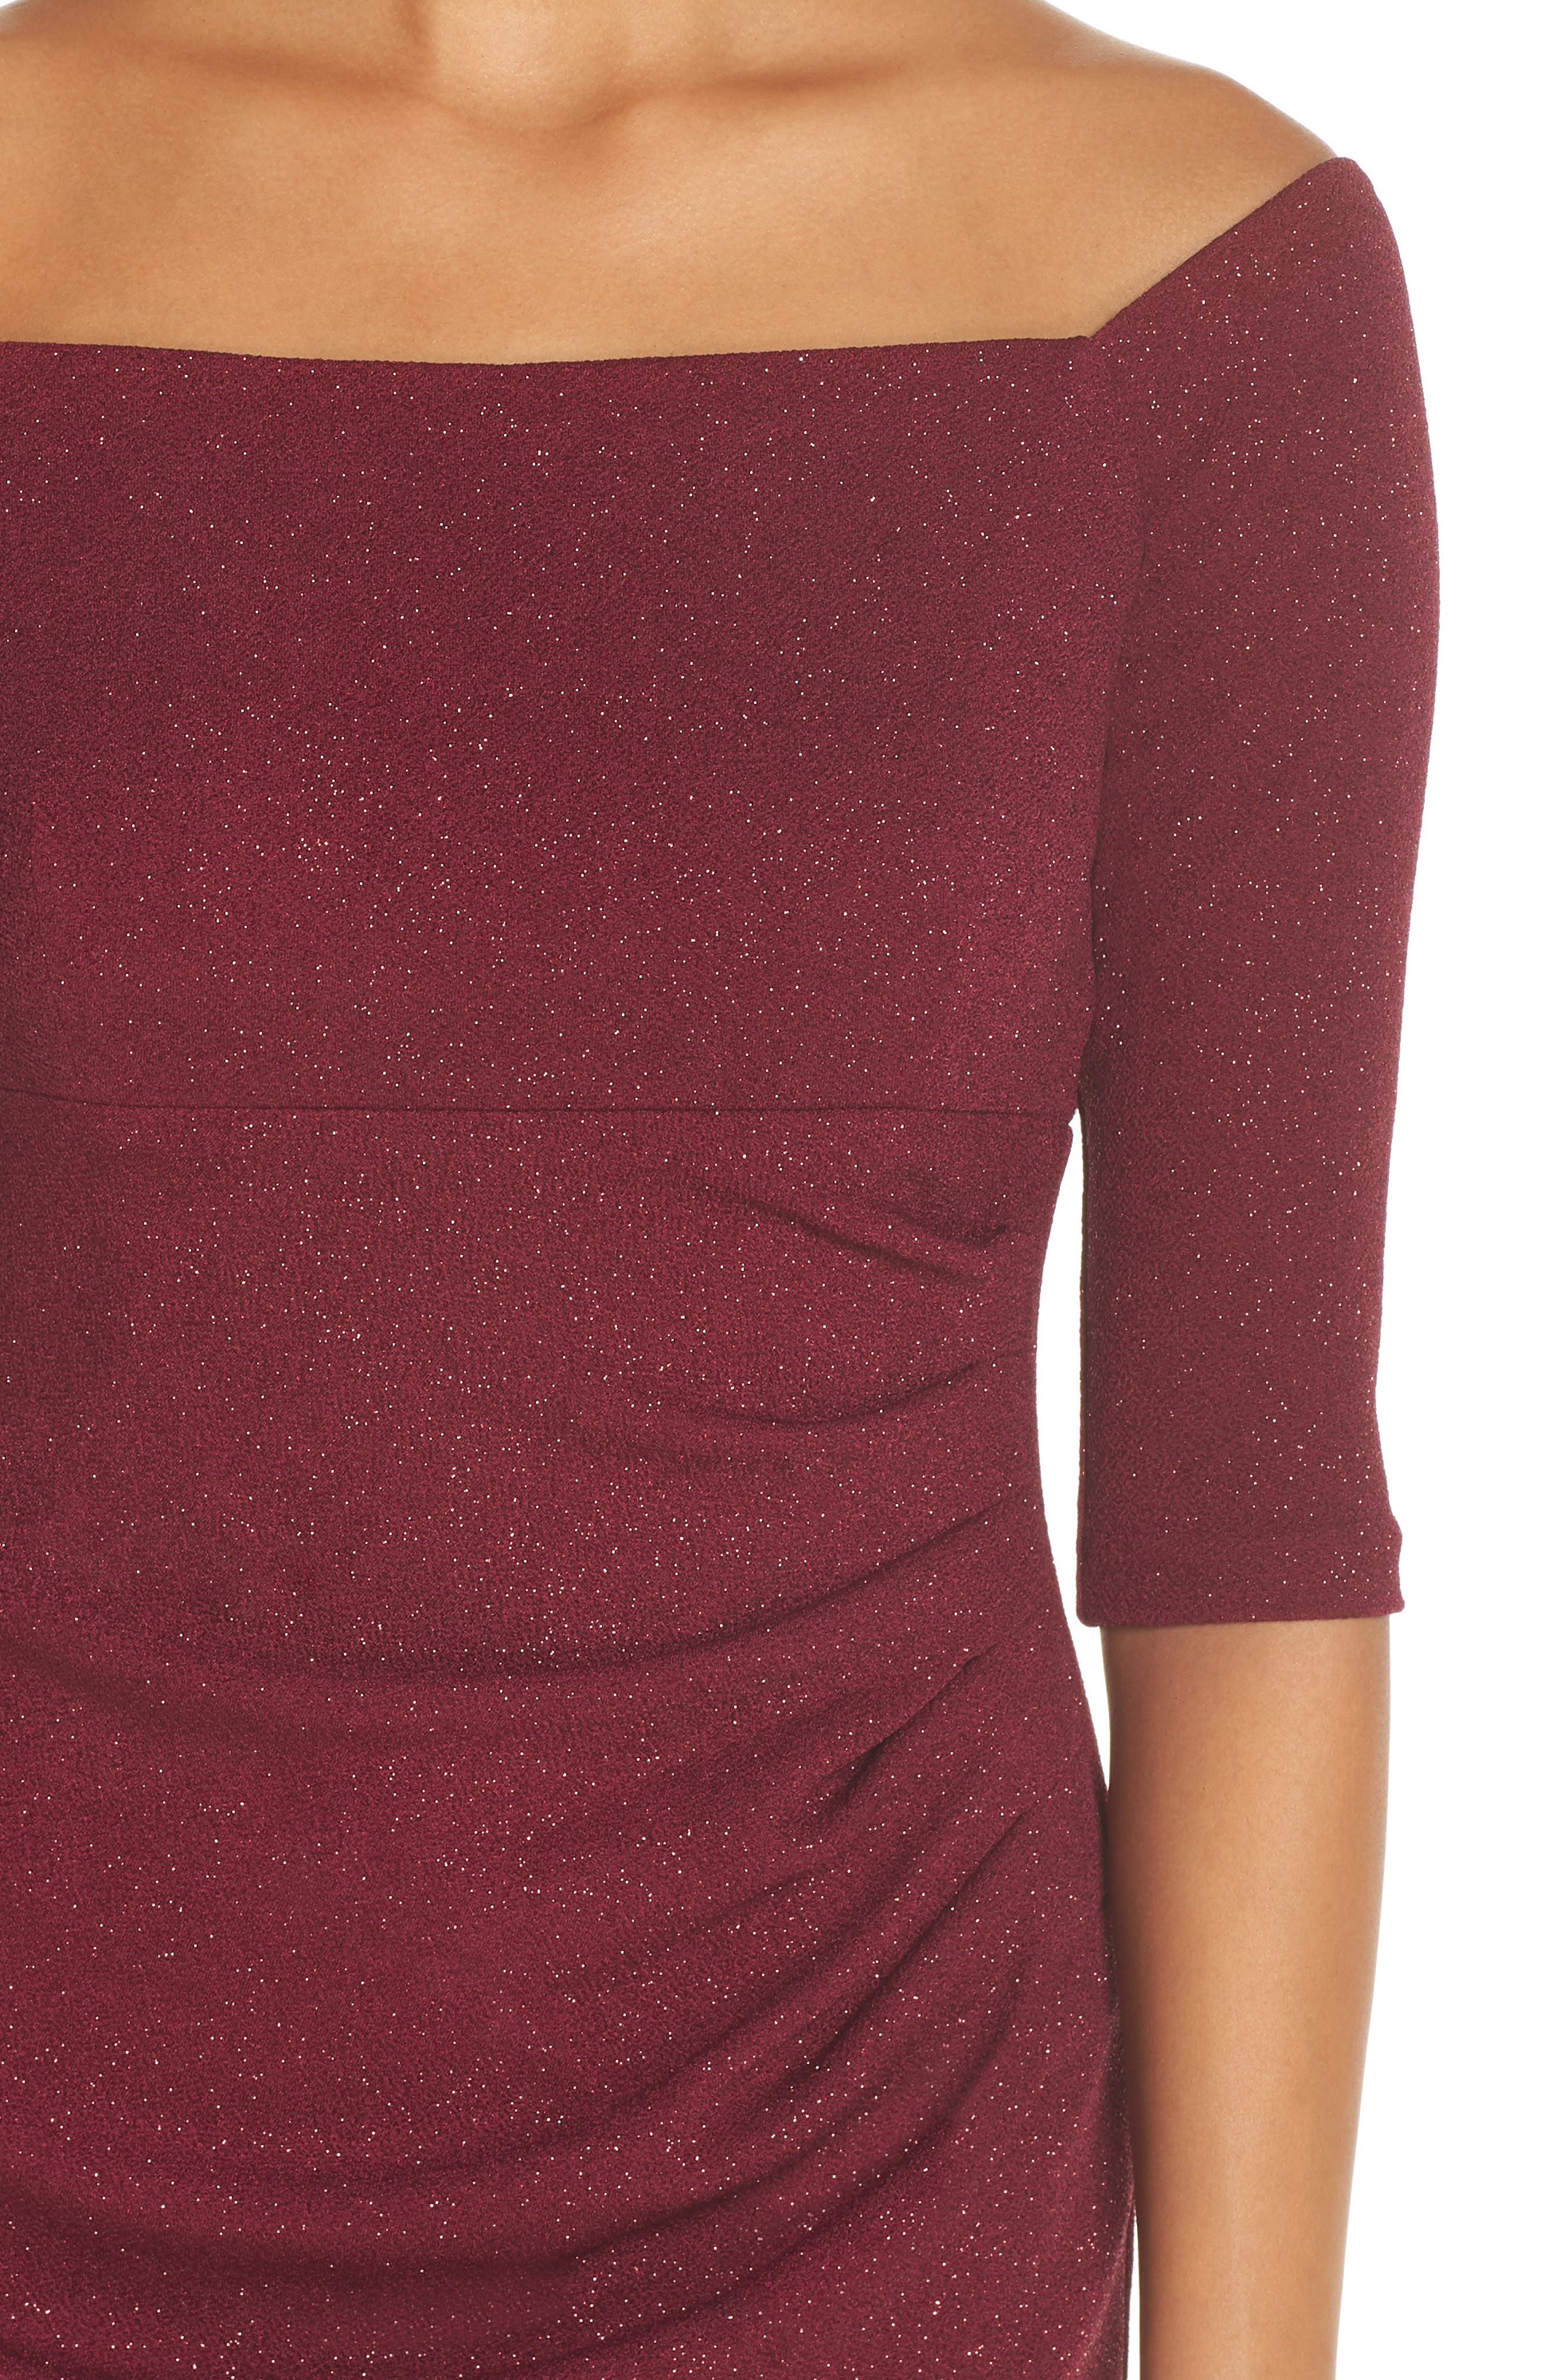 ELIZA J, Off the Shoulder Sheath Dress, Alternate thumbnail 5, color, WINE